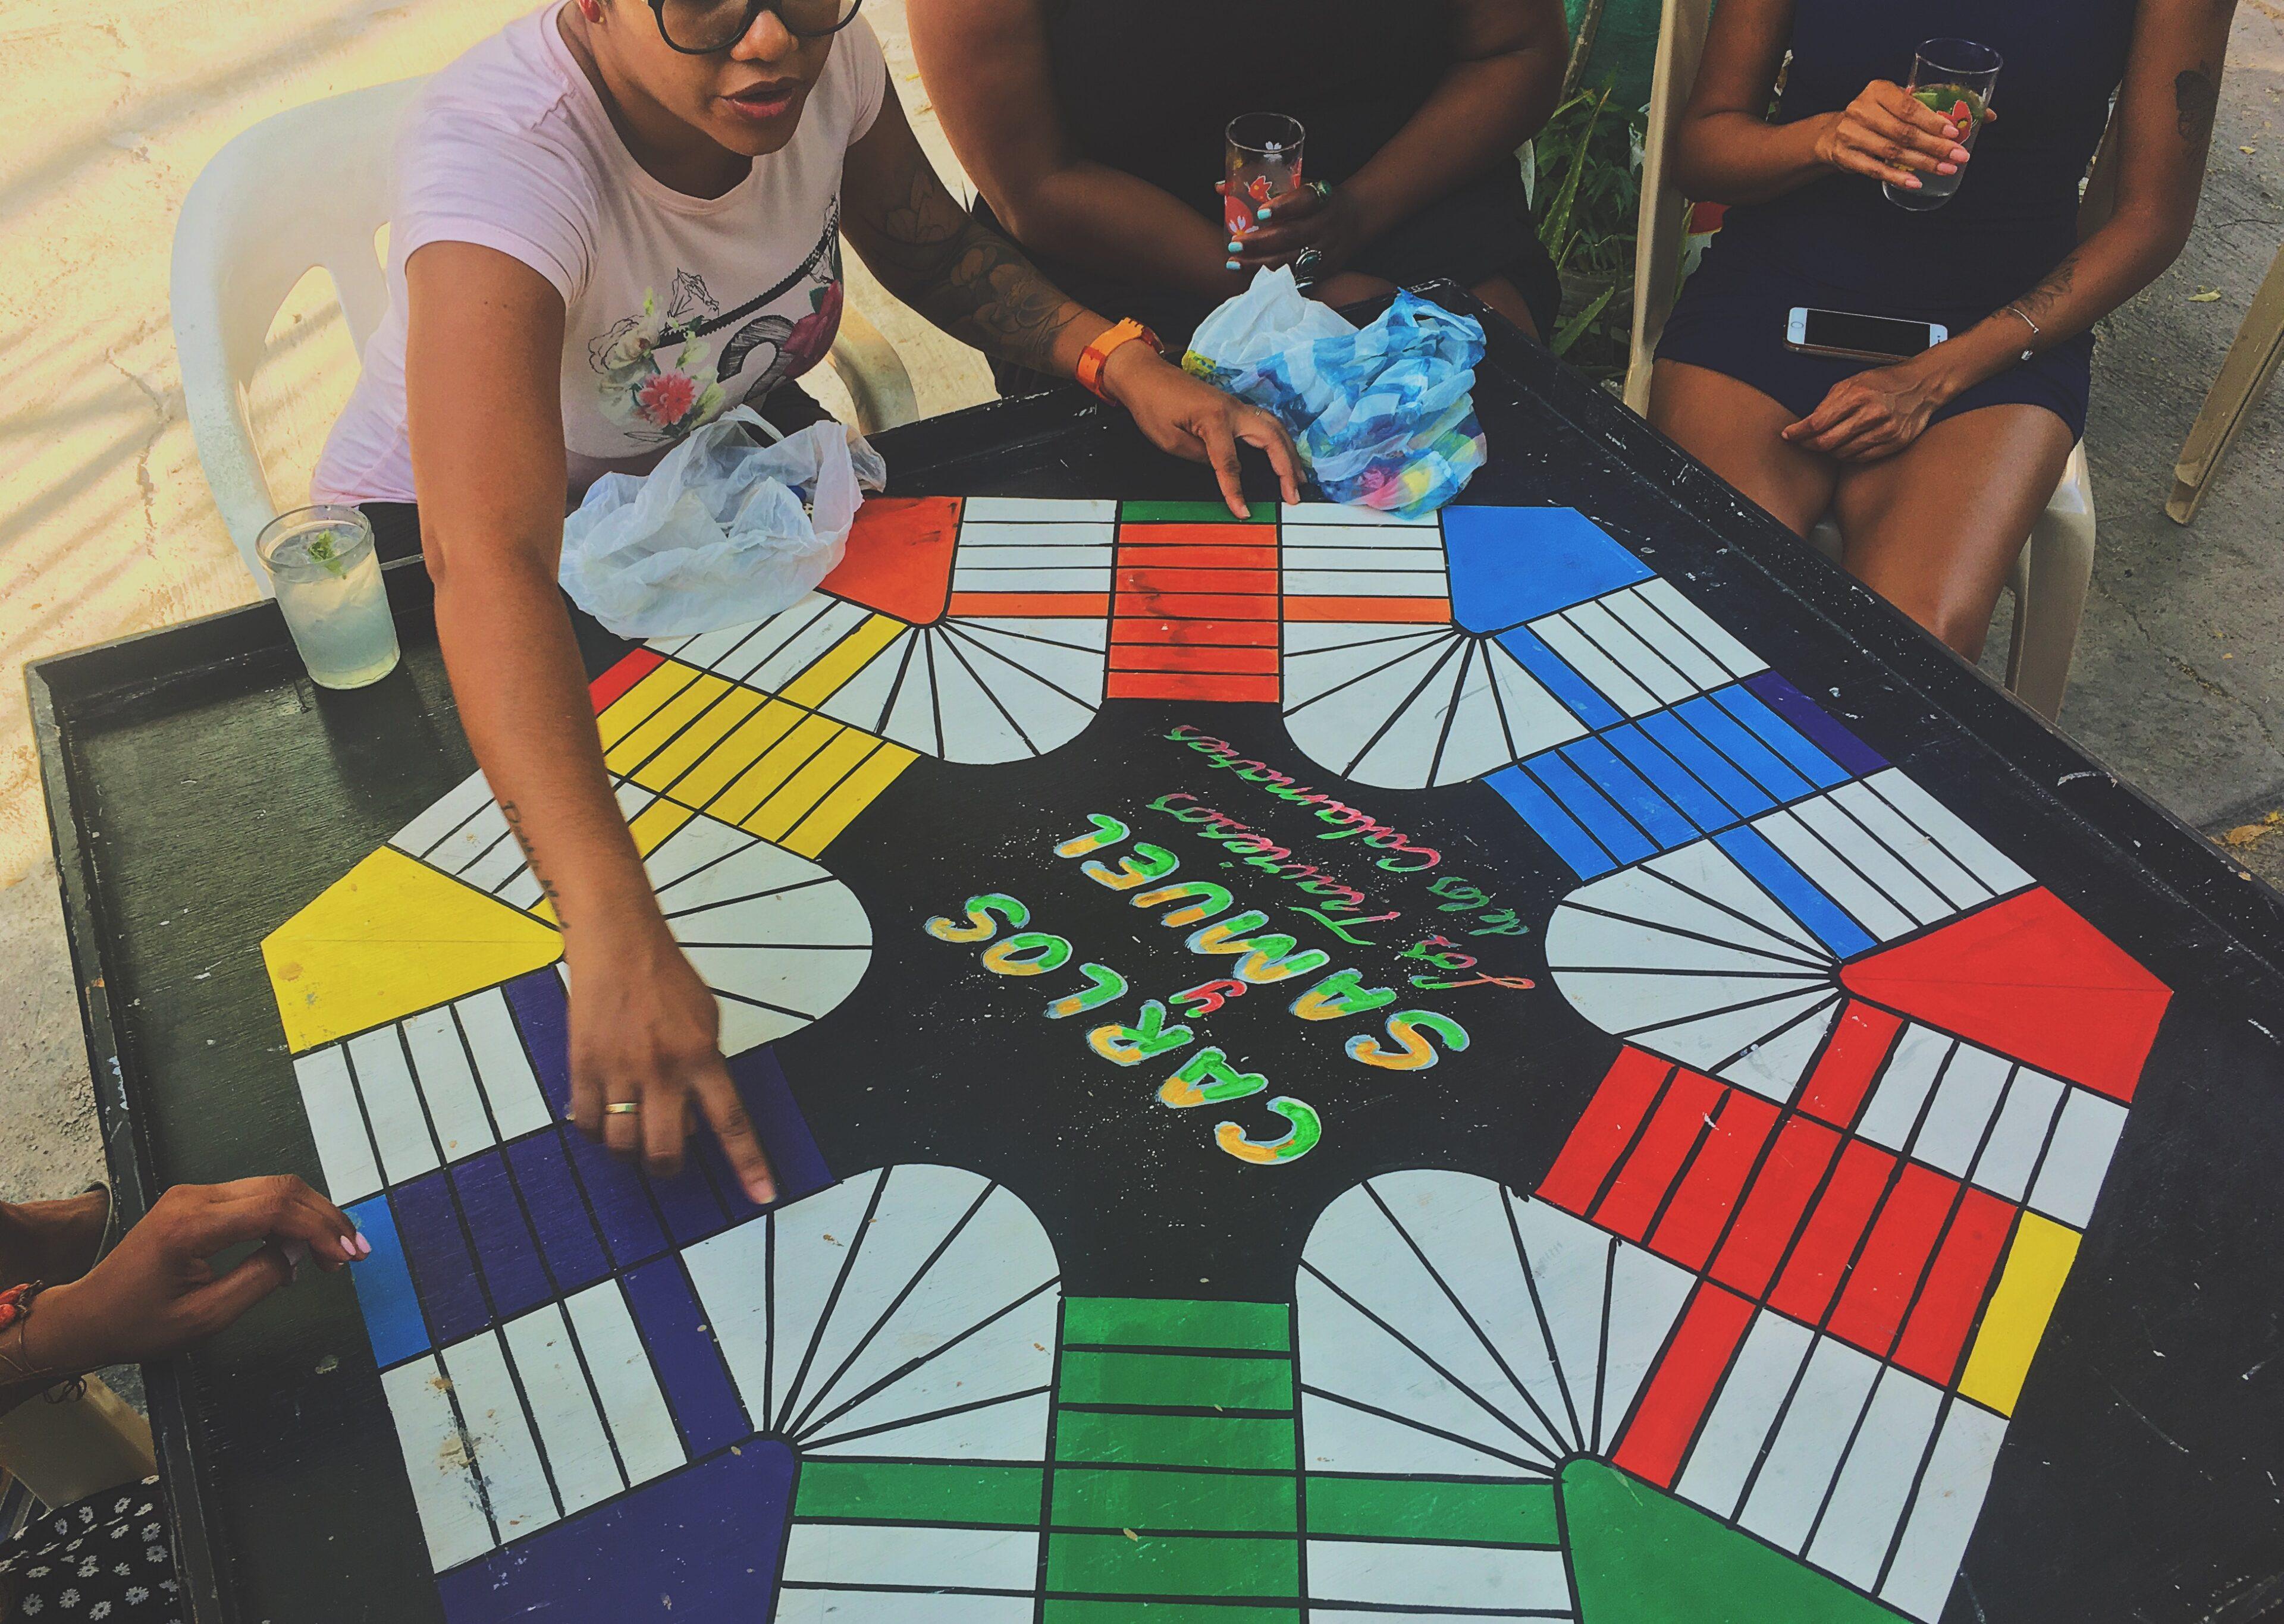 lcm-livecgothesminded-cartagena-colombia-board game